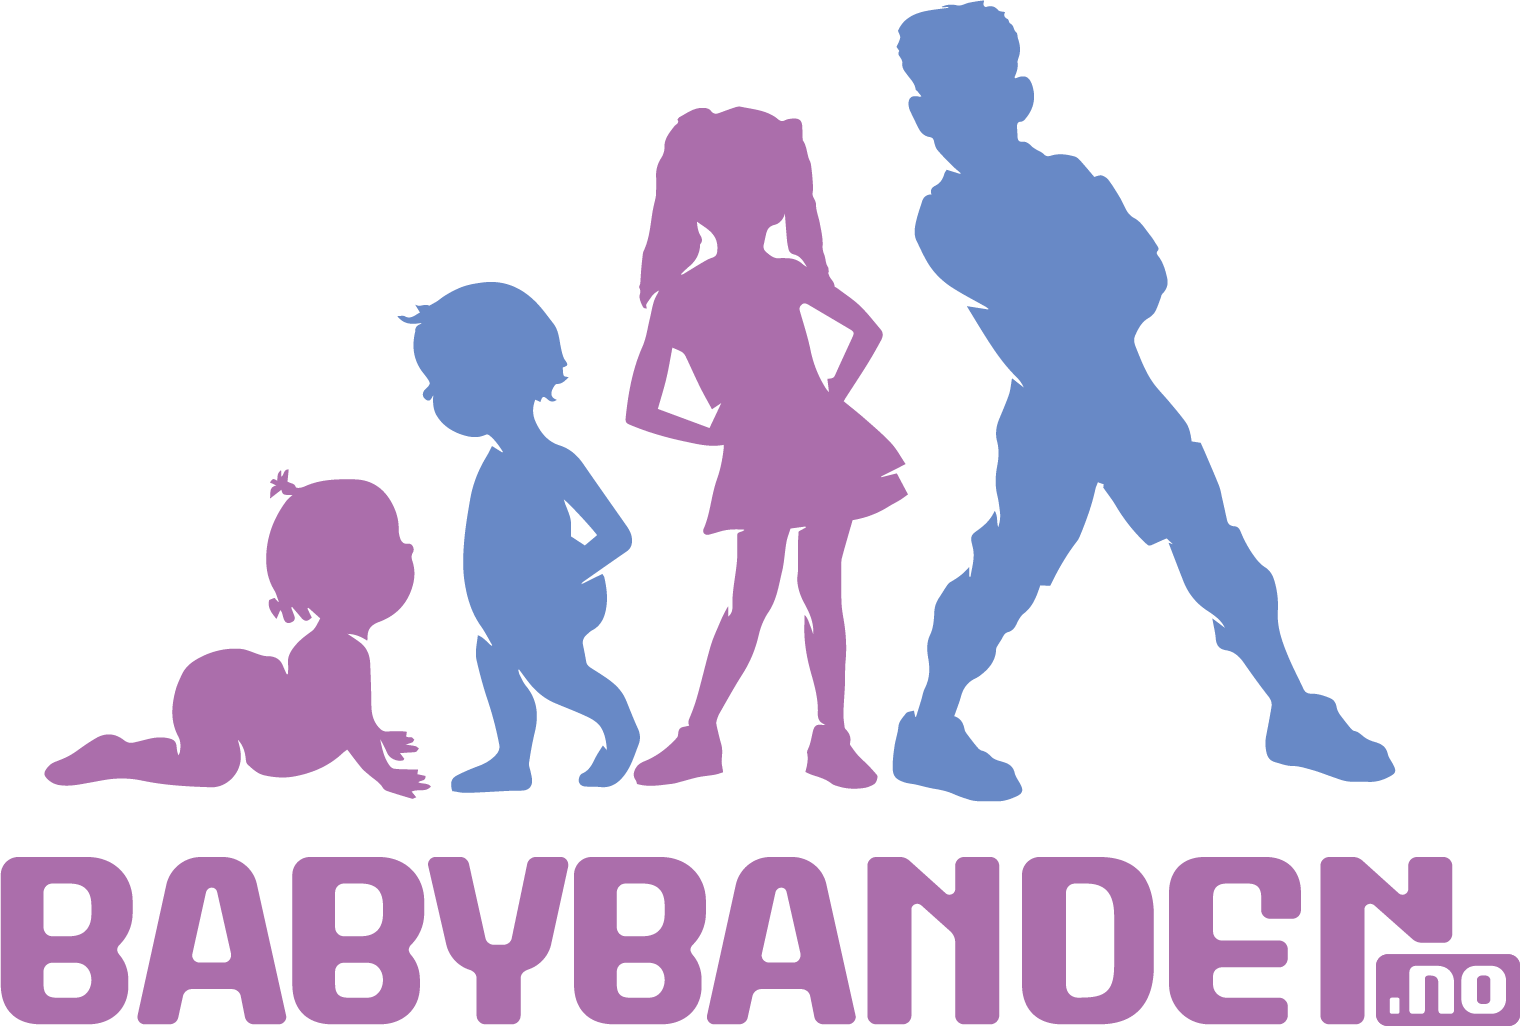 babybanden.png